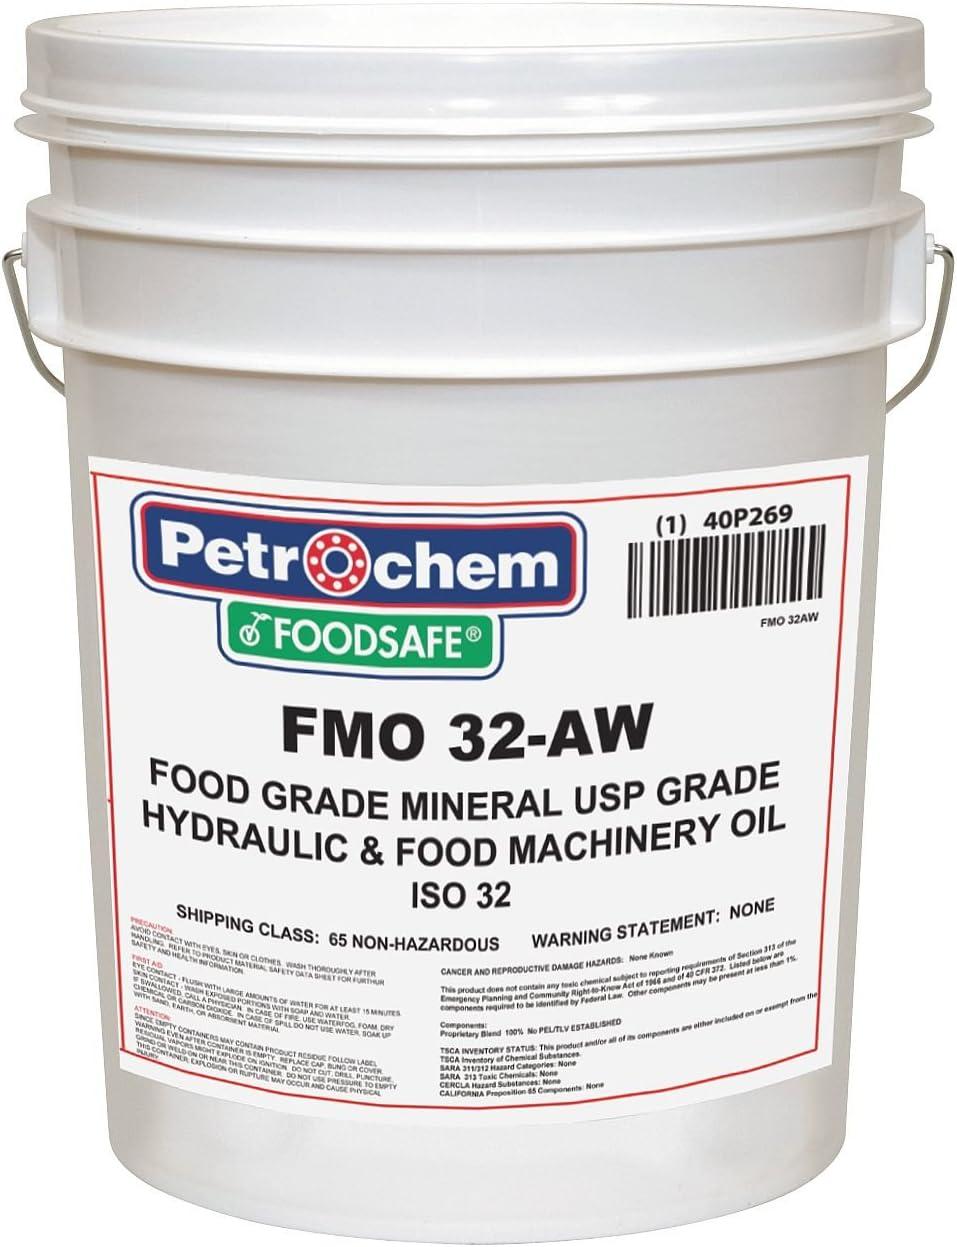 Petrochem Mineral Hydraulic Oil, Food Grade, 5 gal.